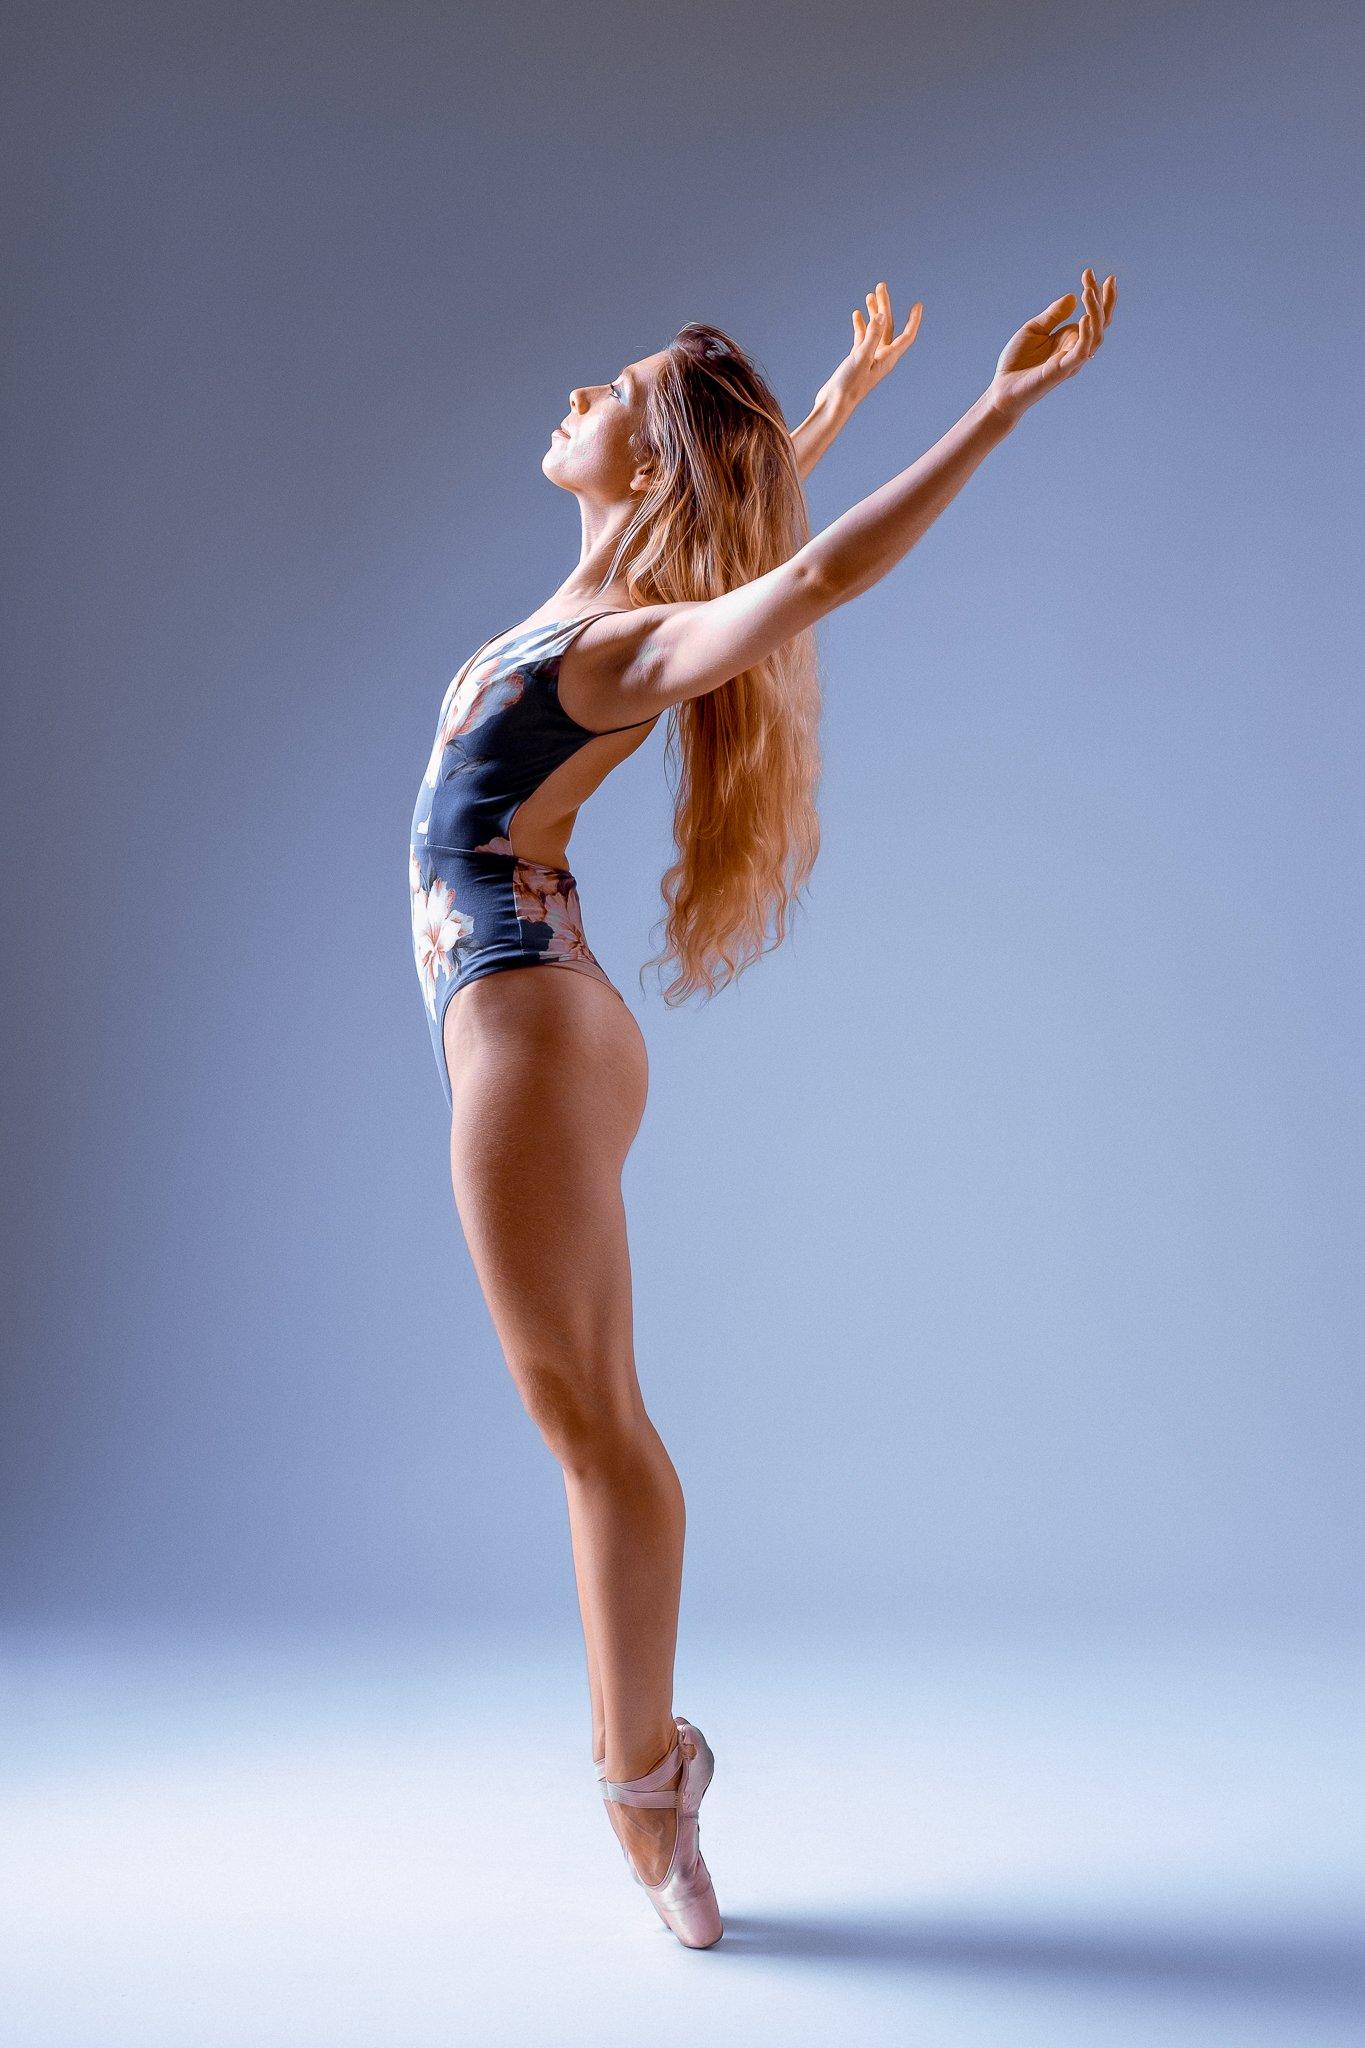 girl, female, pretty, portrait, dancer, blonde, Saulius Ke